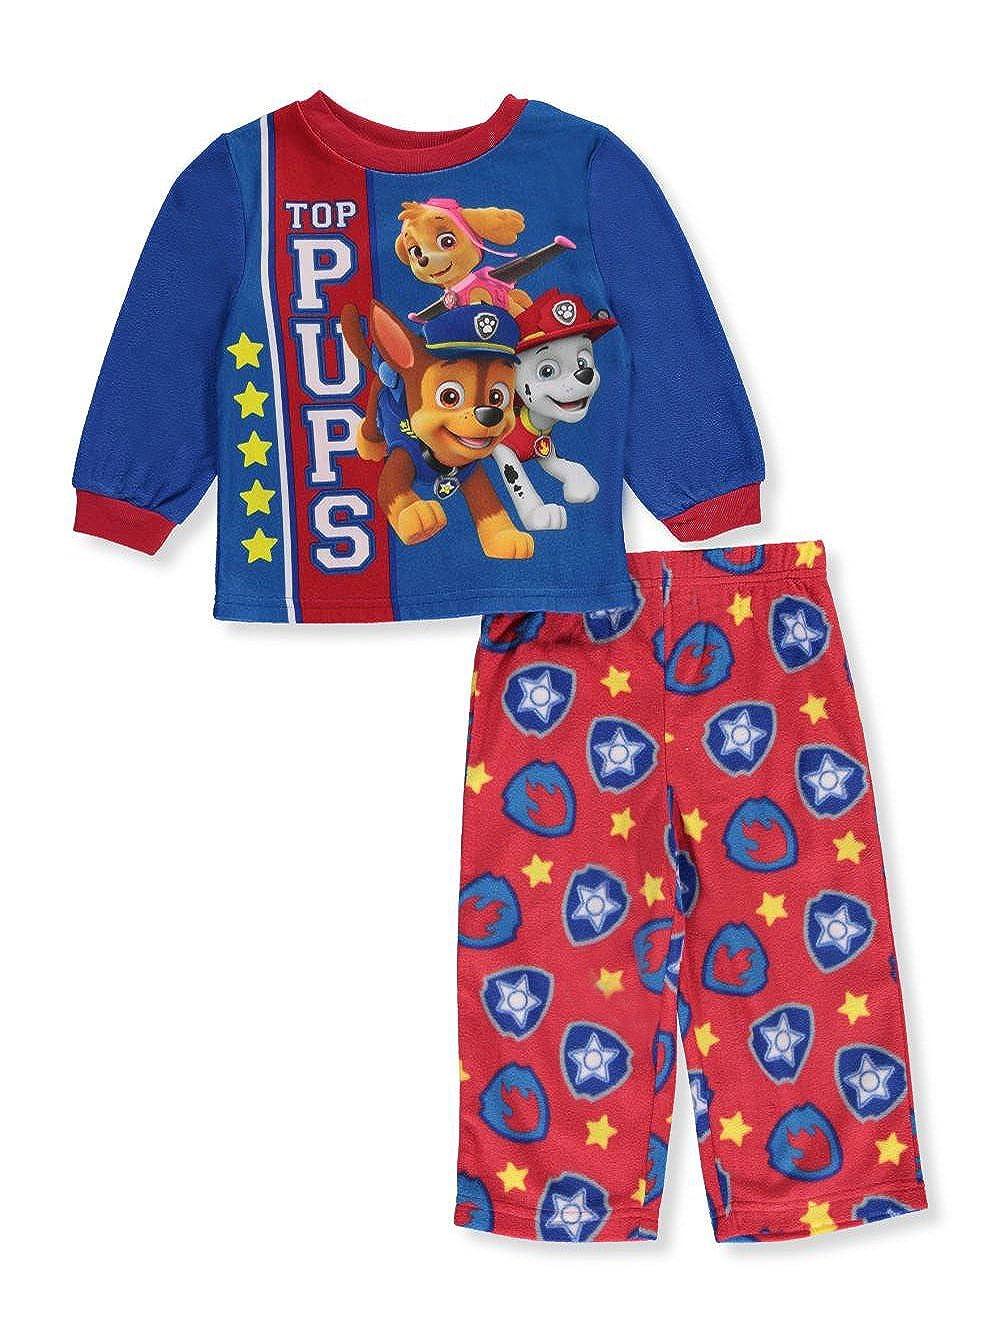 Five Years Old Girl Birthday Gift Im 5 Toddler Hoodie TeeStars